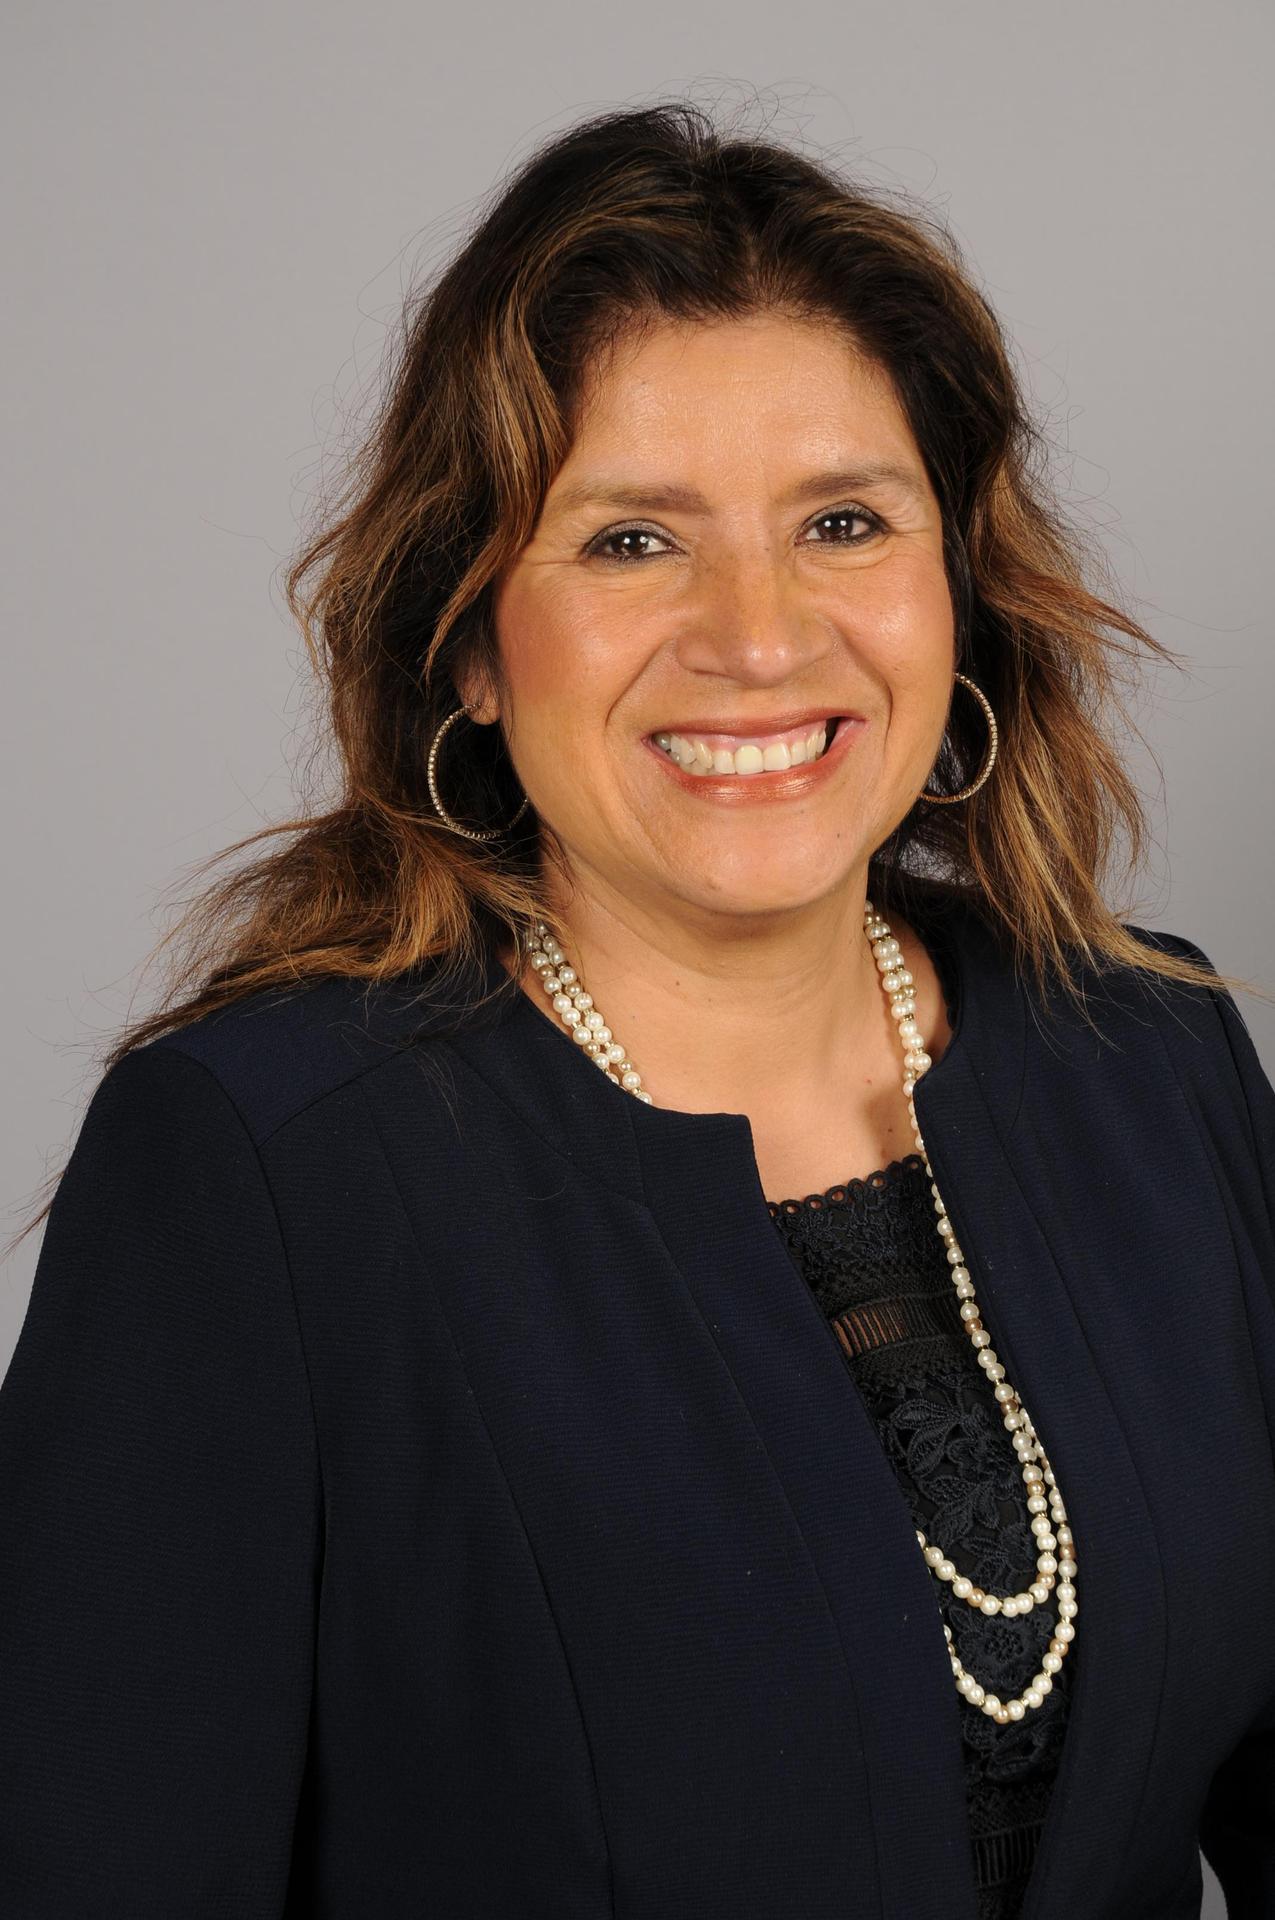 Superintendent Norma Martinez